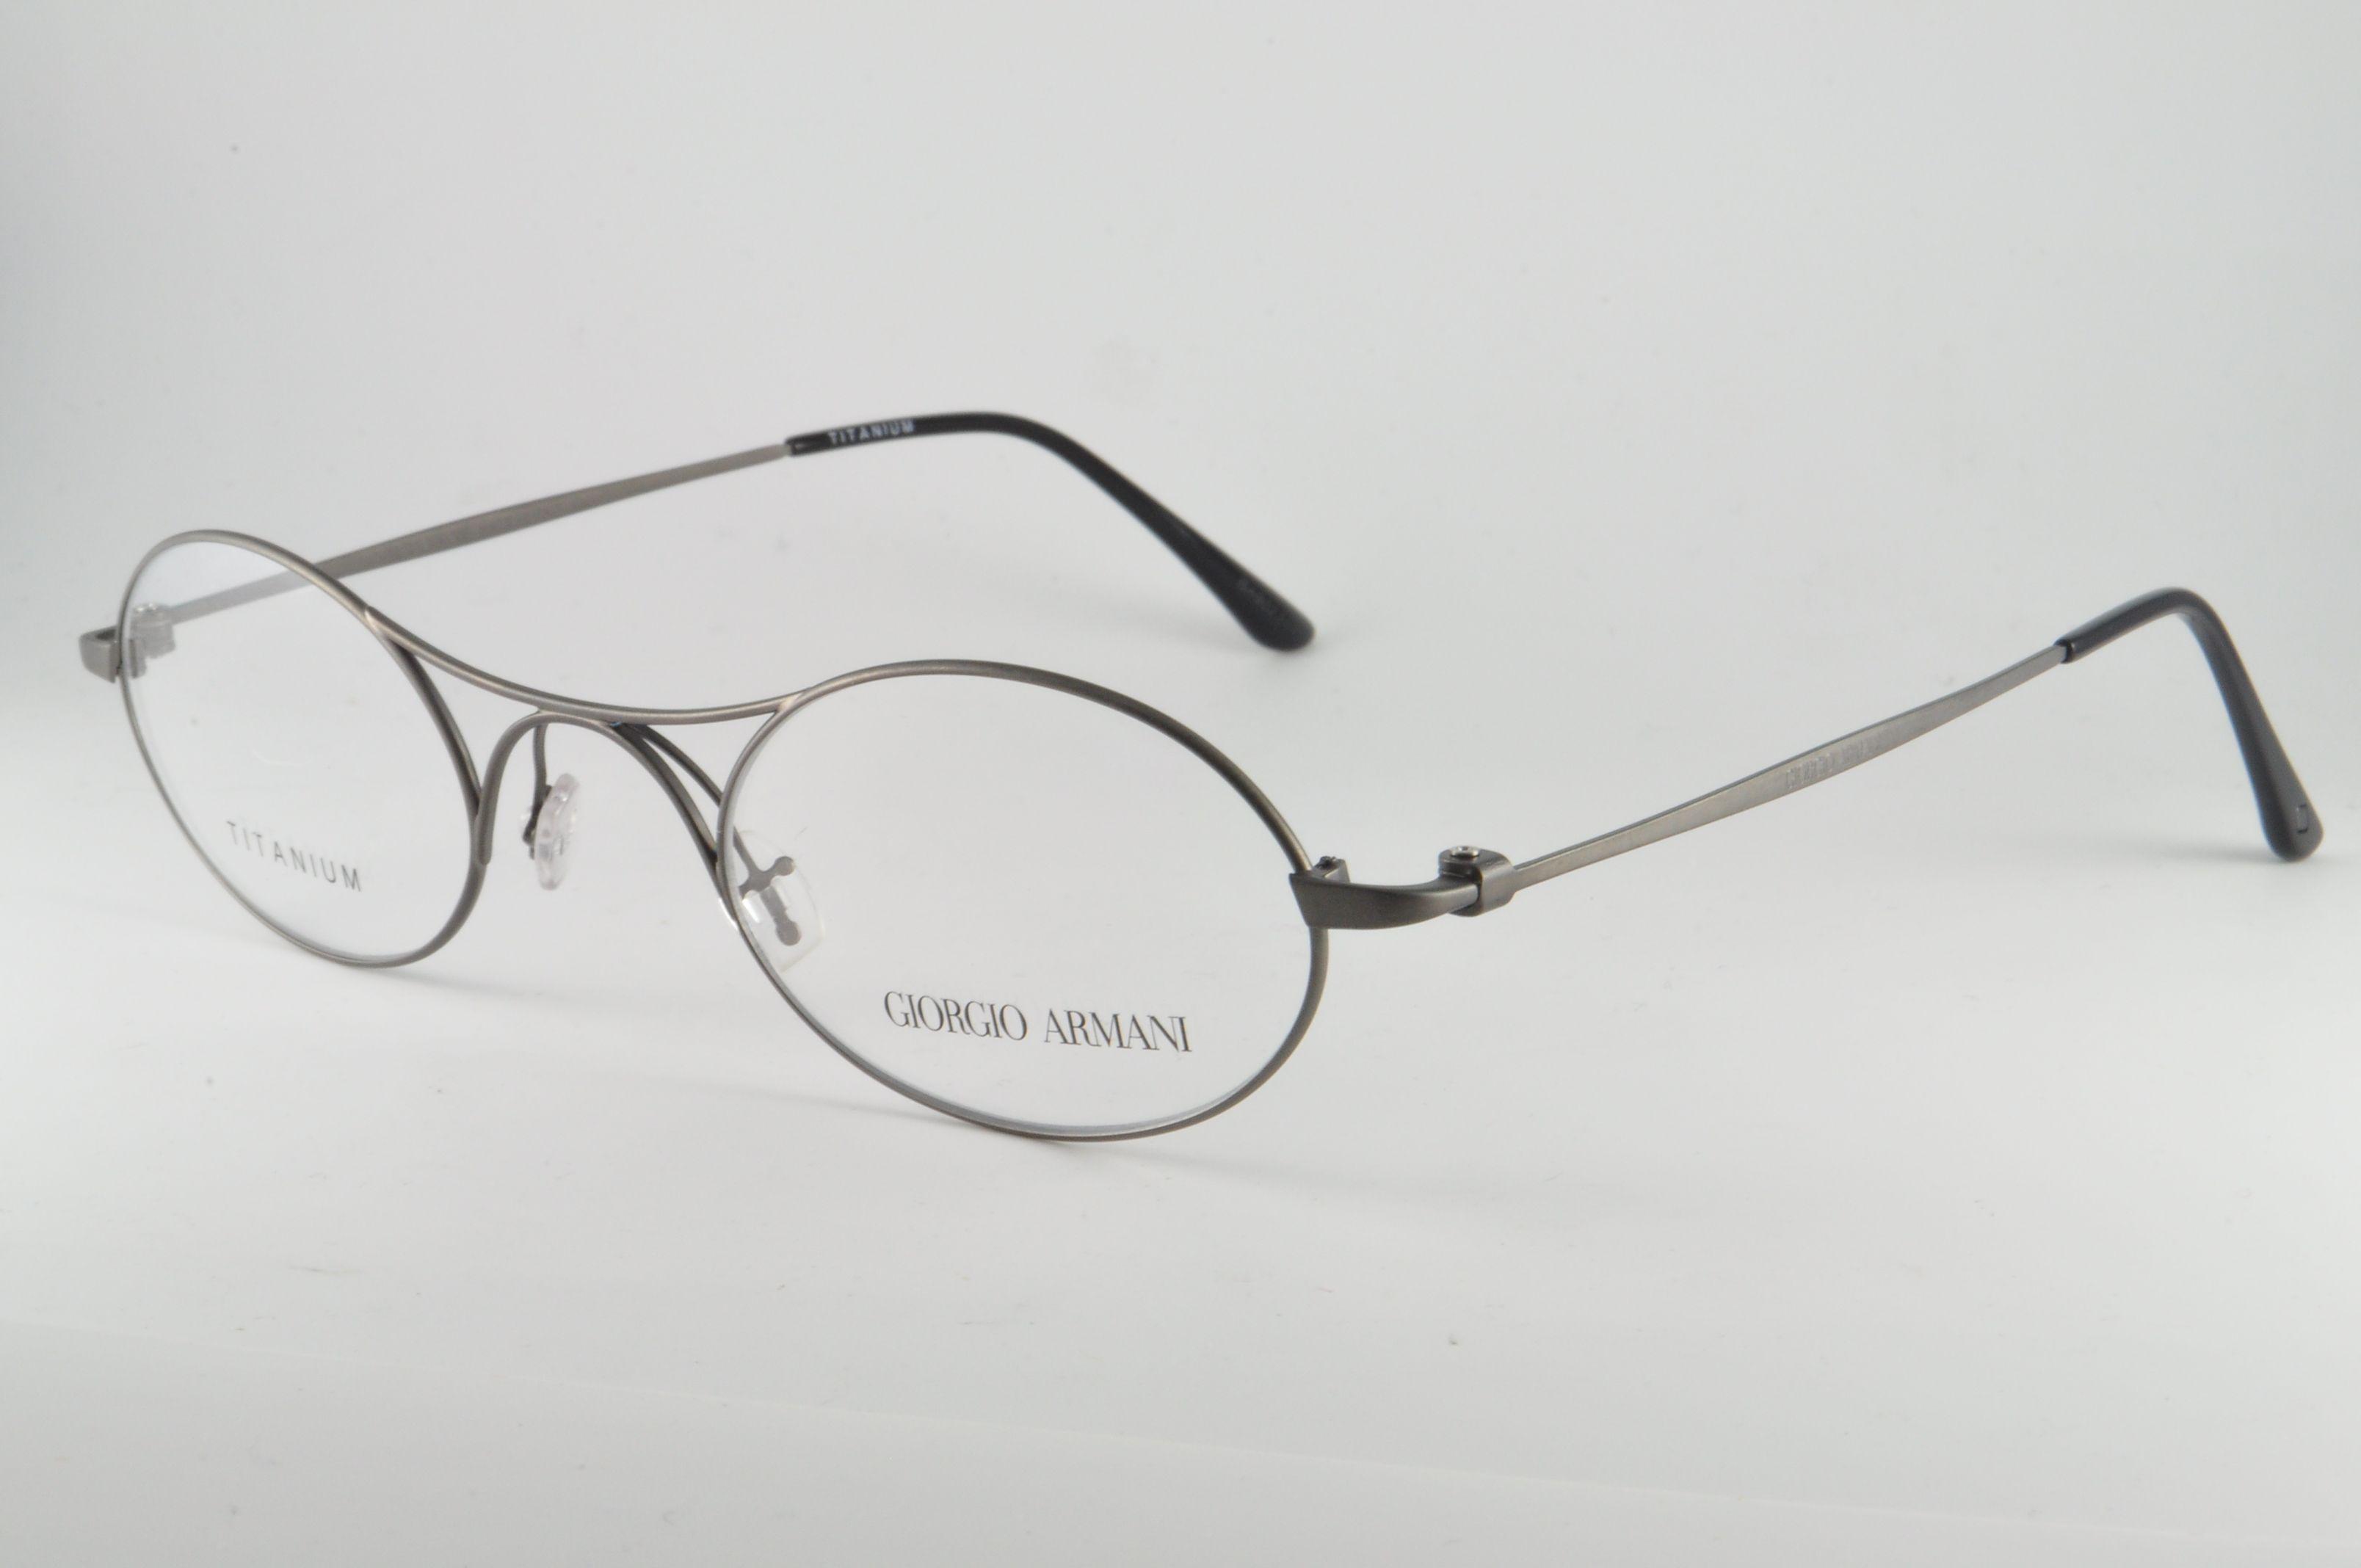 Giorgio Armani Eyeglasses AR 5027T 3003 Matte Gunmetal, Size 45-24 ...